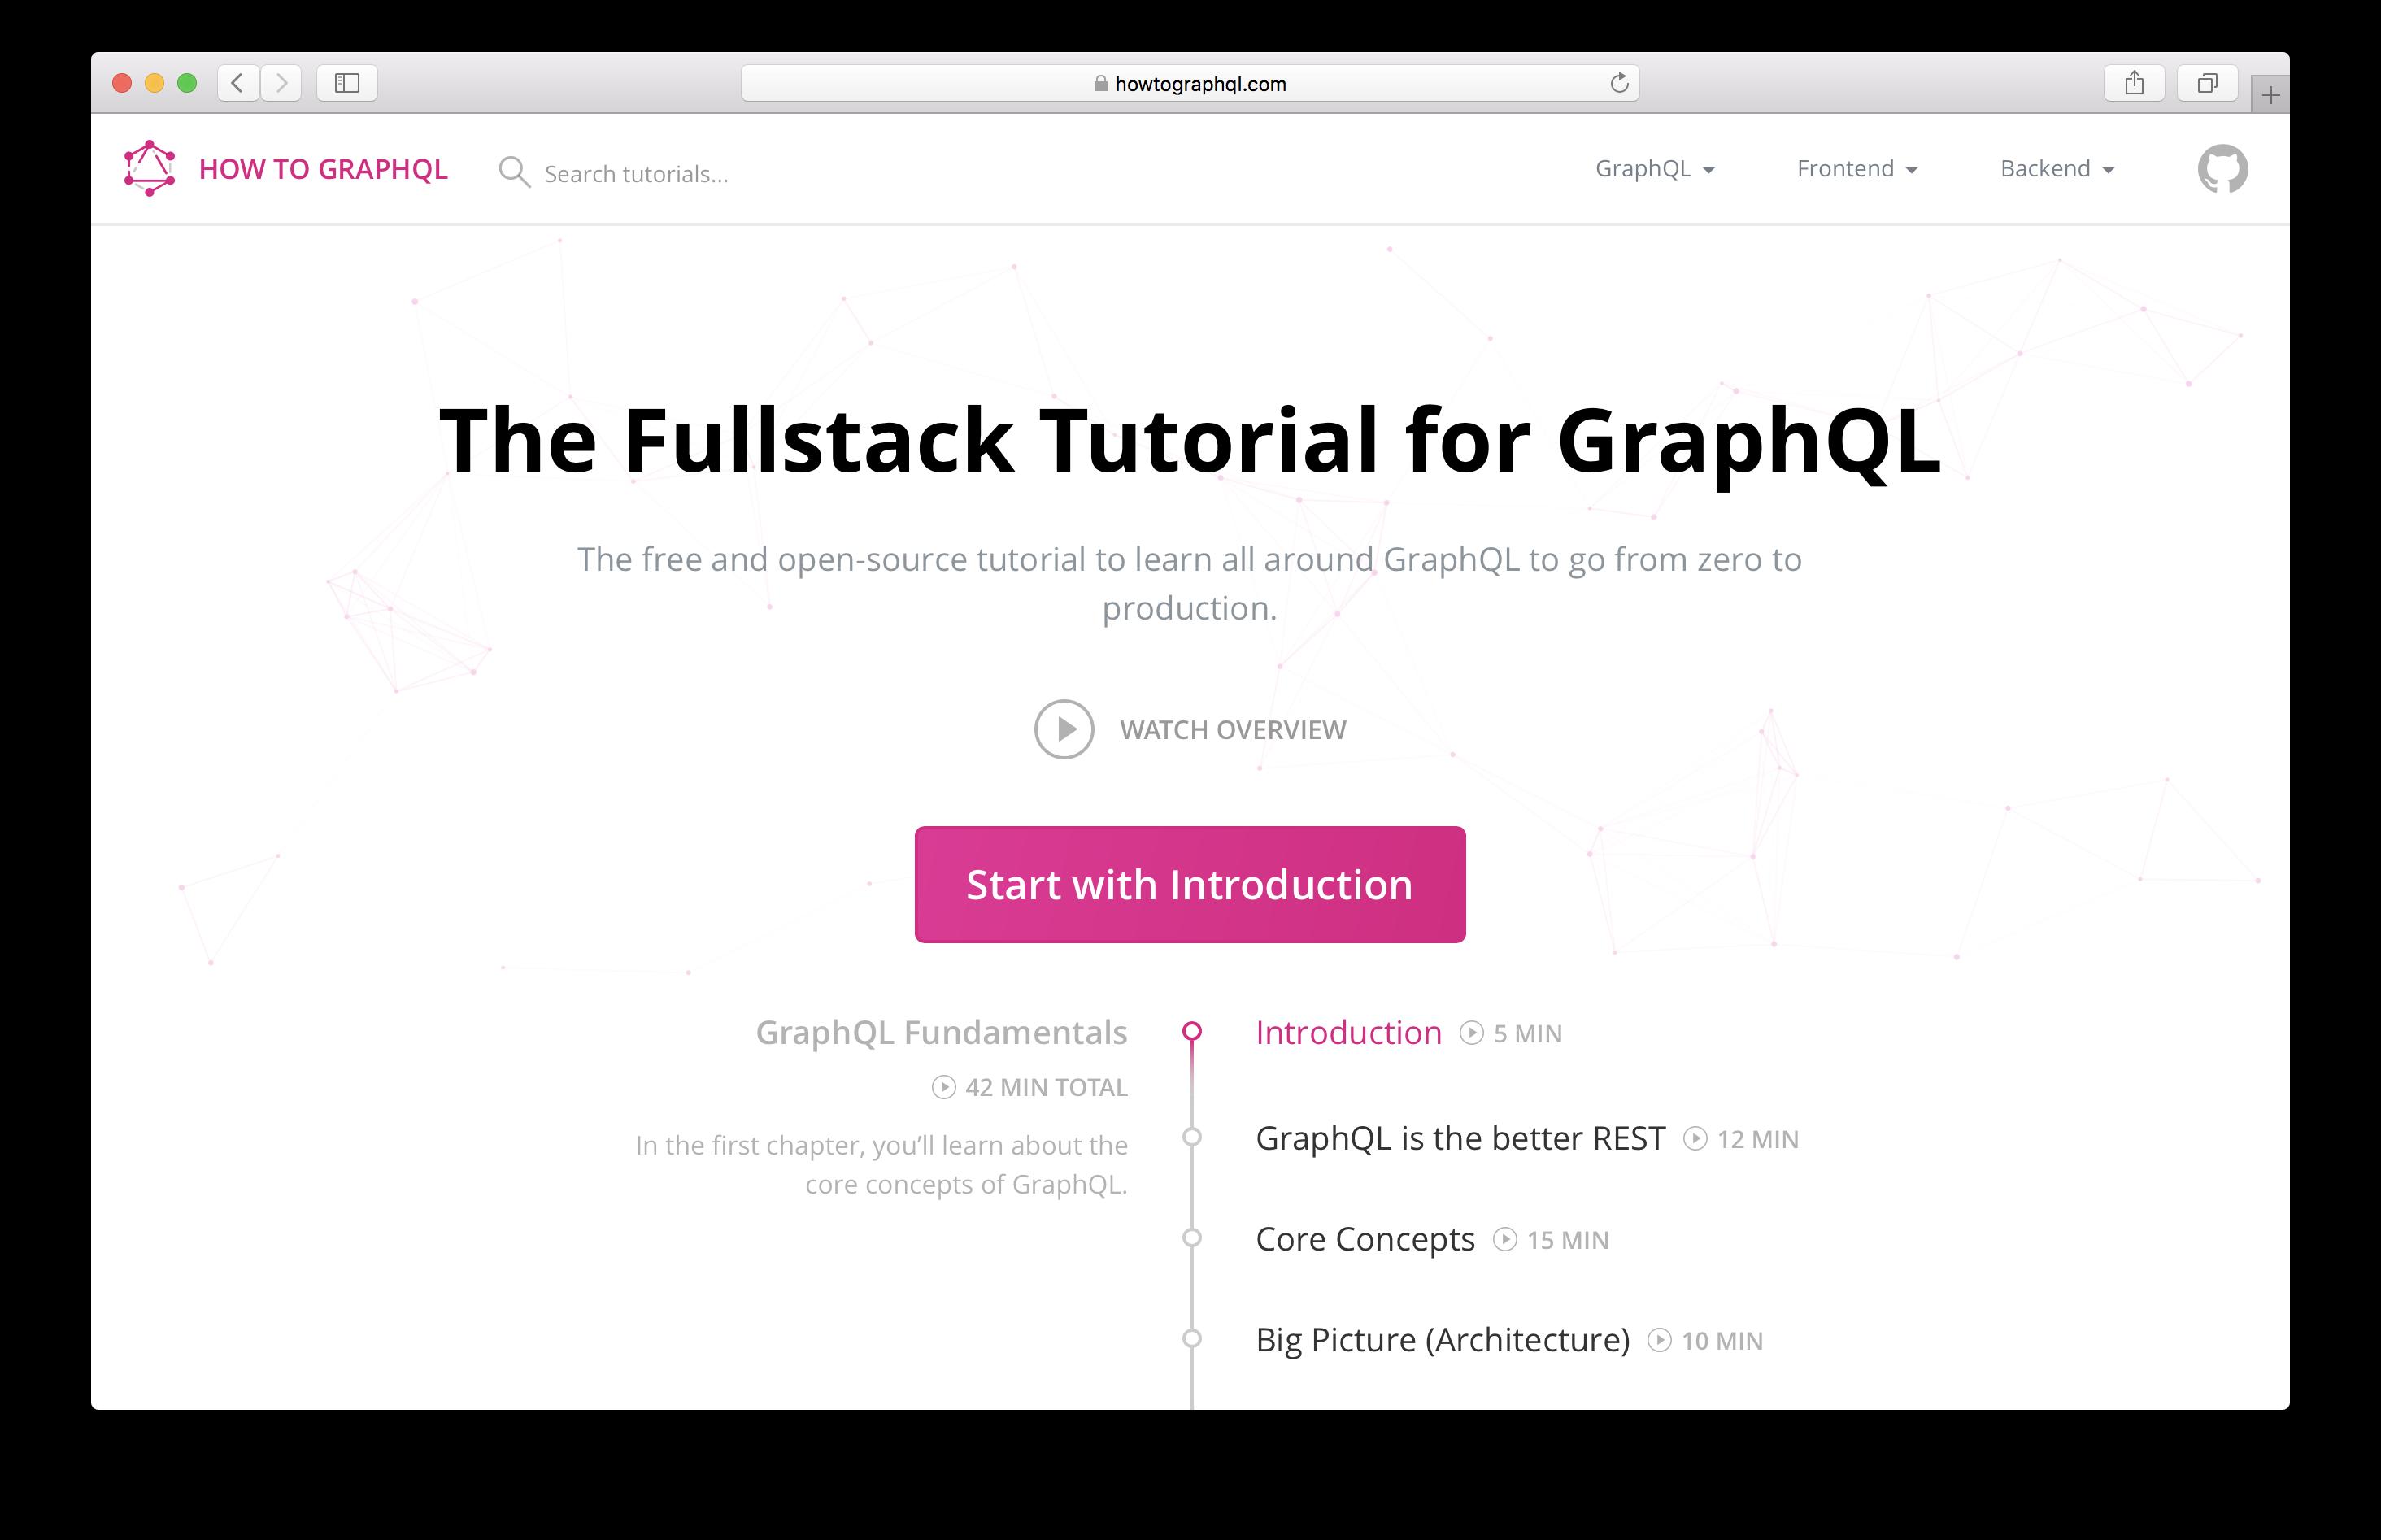 GitHub - howtographql/howtographql: The Fullstack Tutorial